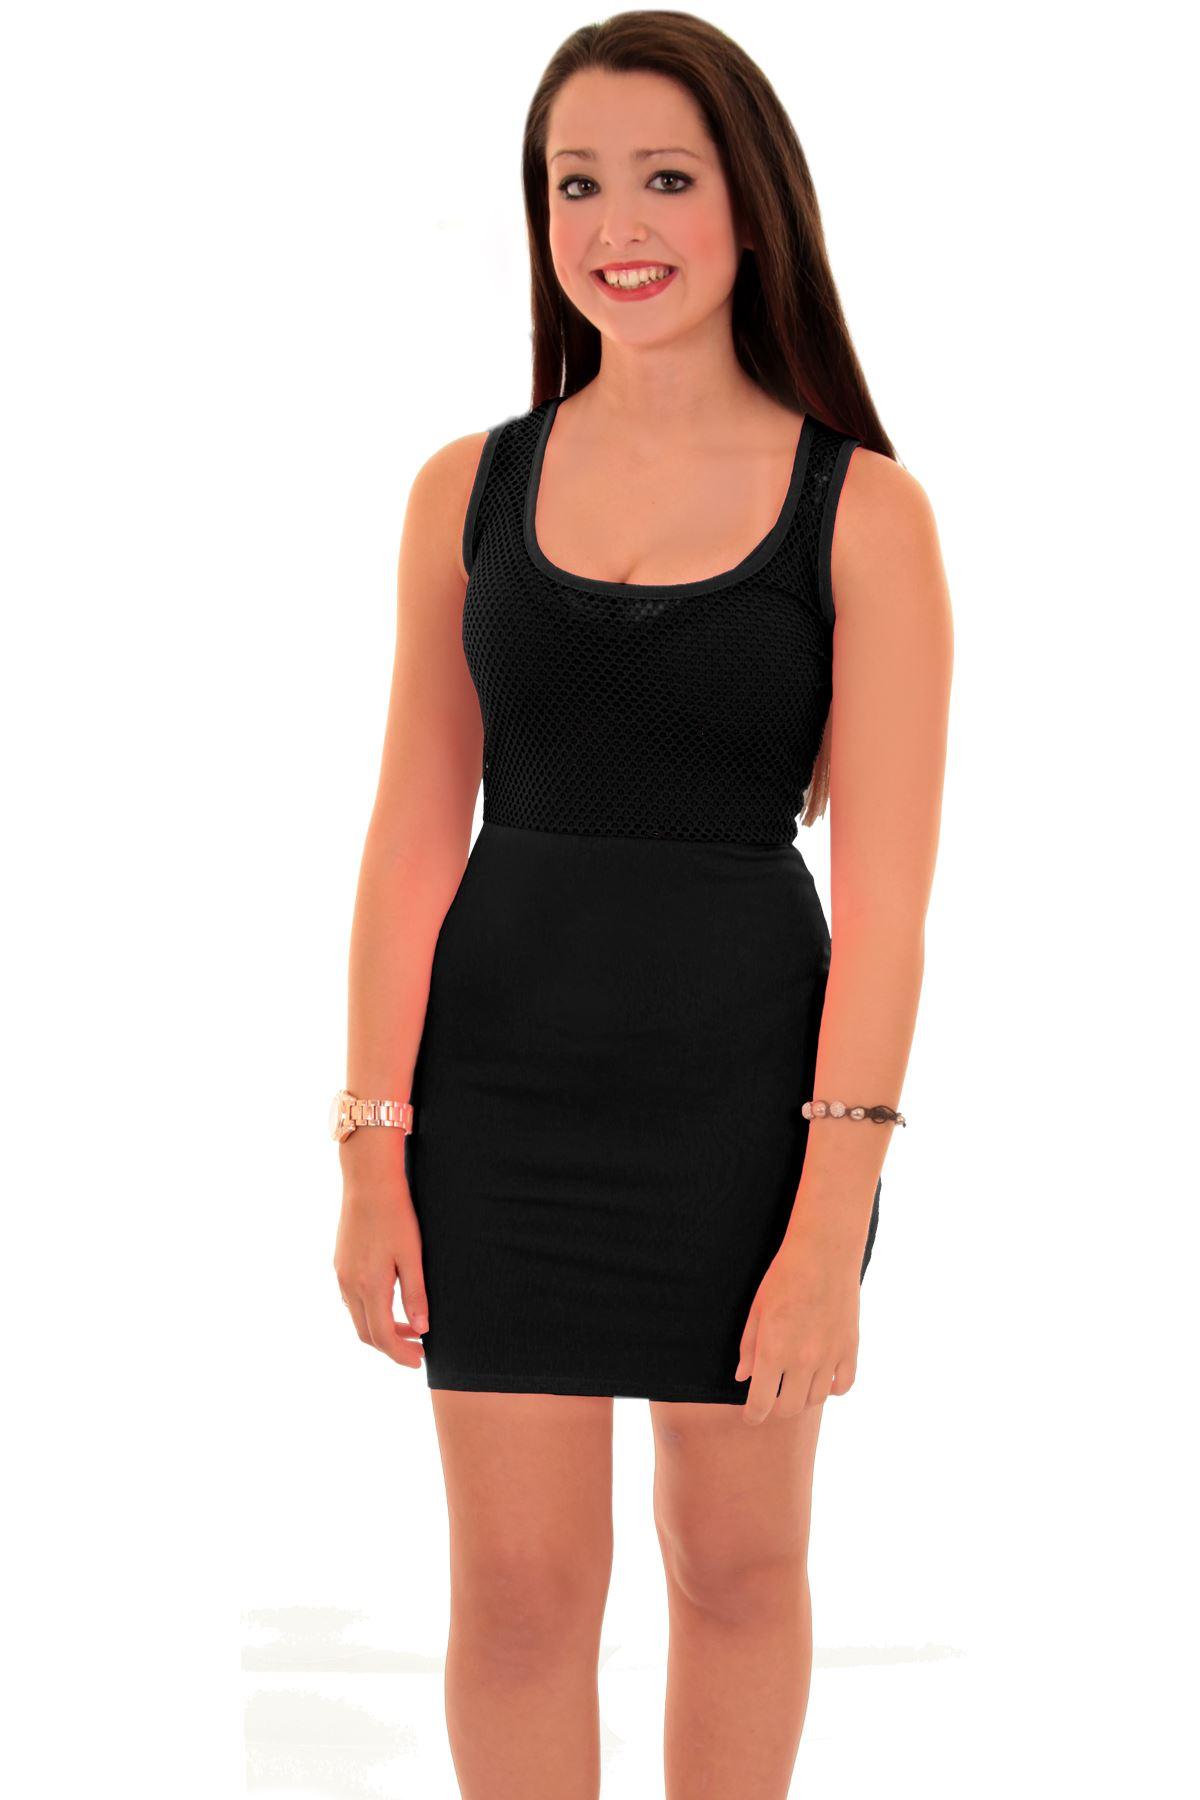 Ladies Celeb Nicole Racer Back Sleeveless Fish Net Bodycon Mini Short Dress | eBay